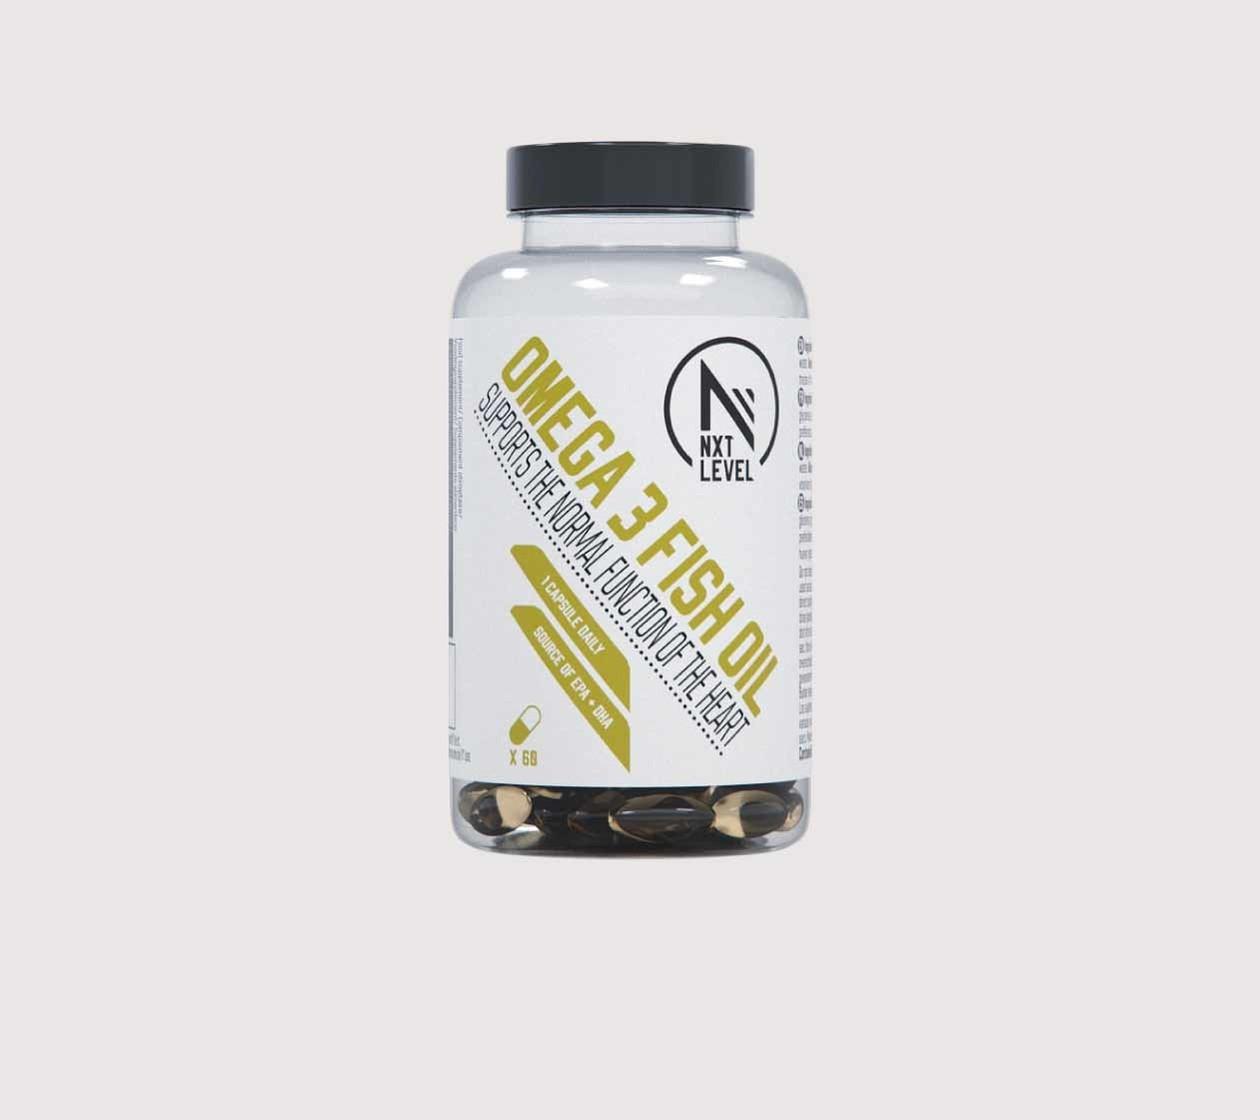 OMEGA 3 FISH OIL - 60 capsules - 1 per dag